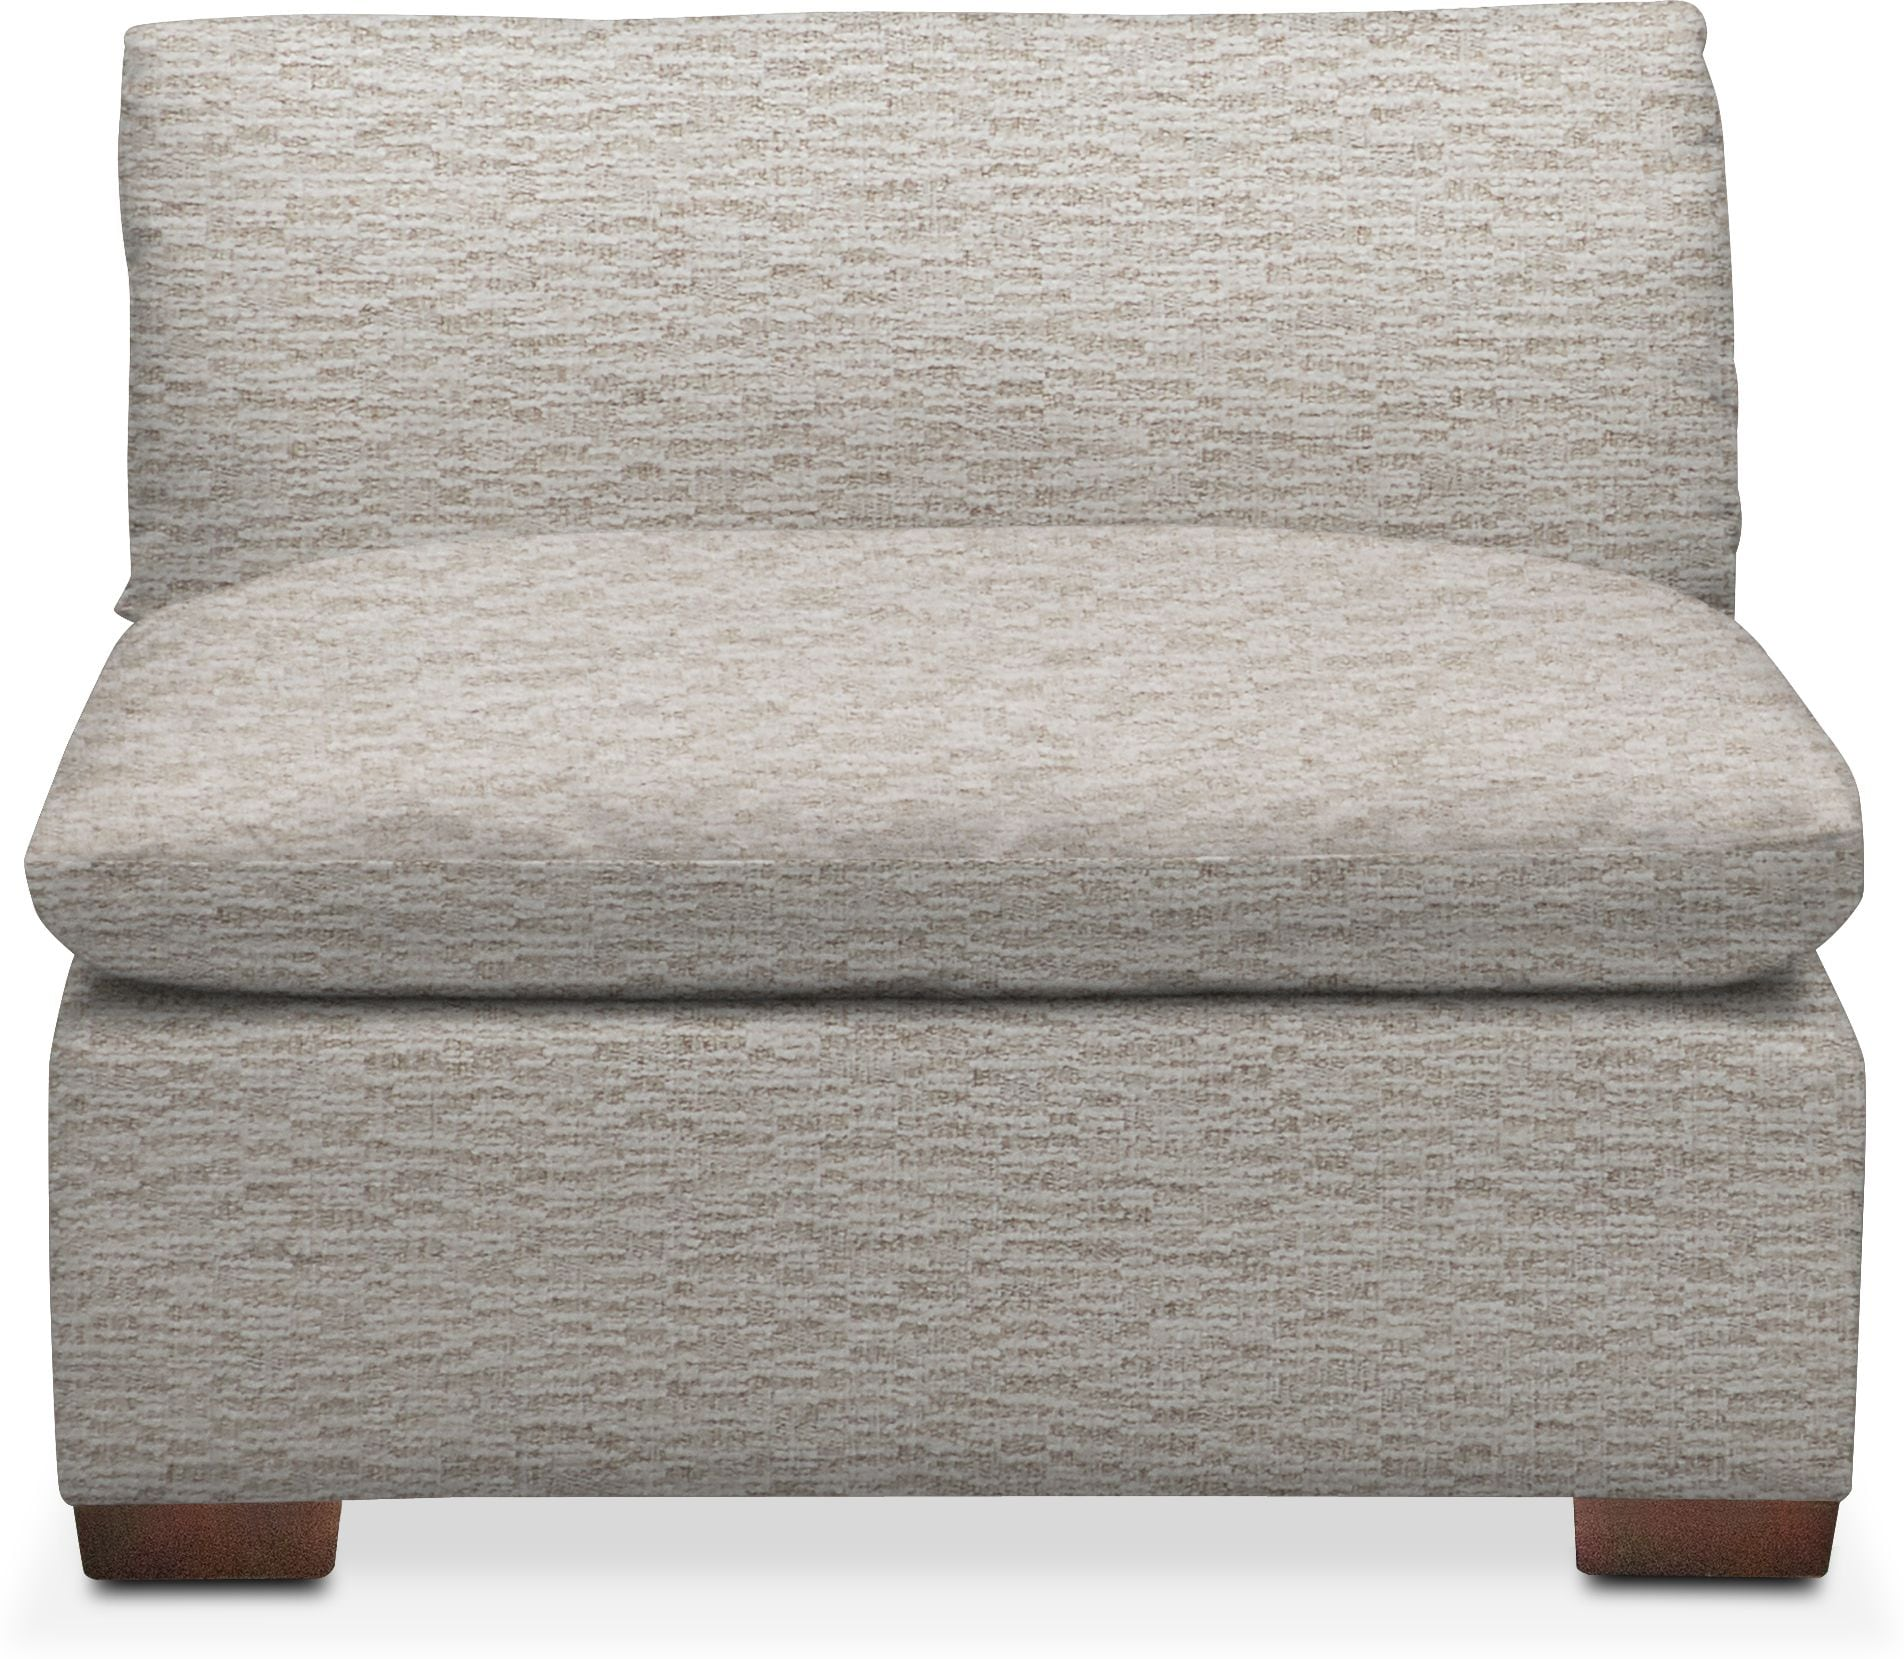 Living Room Furniture - Plush Armless Chair